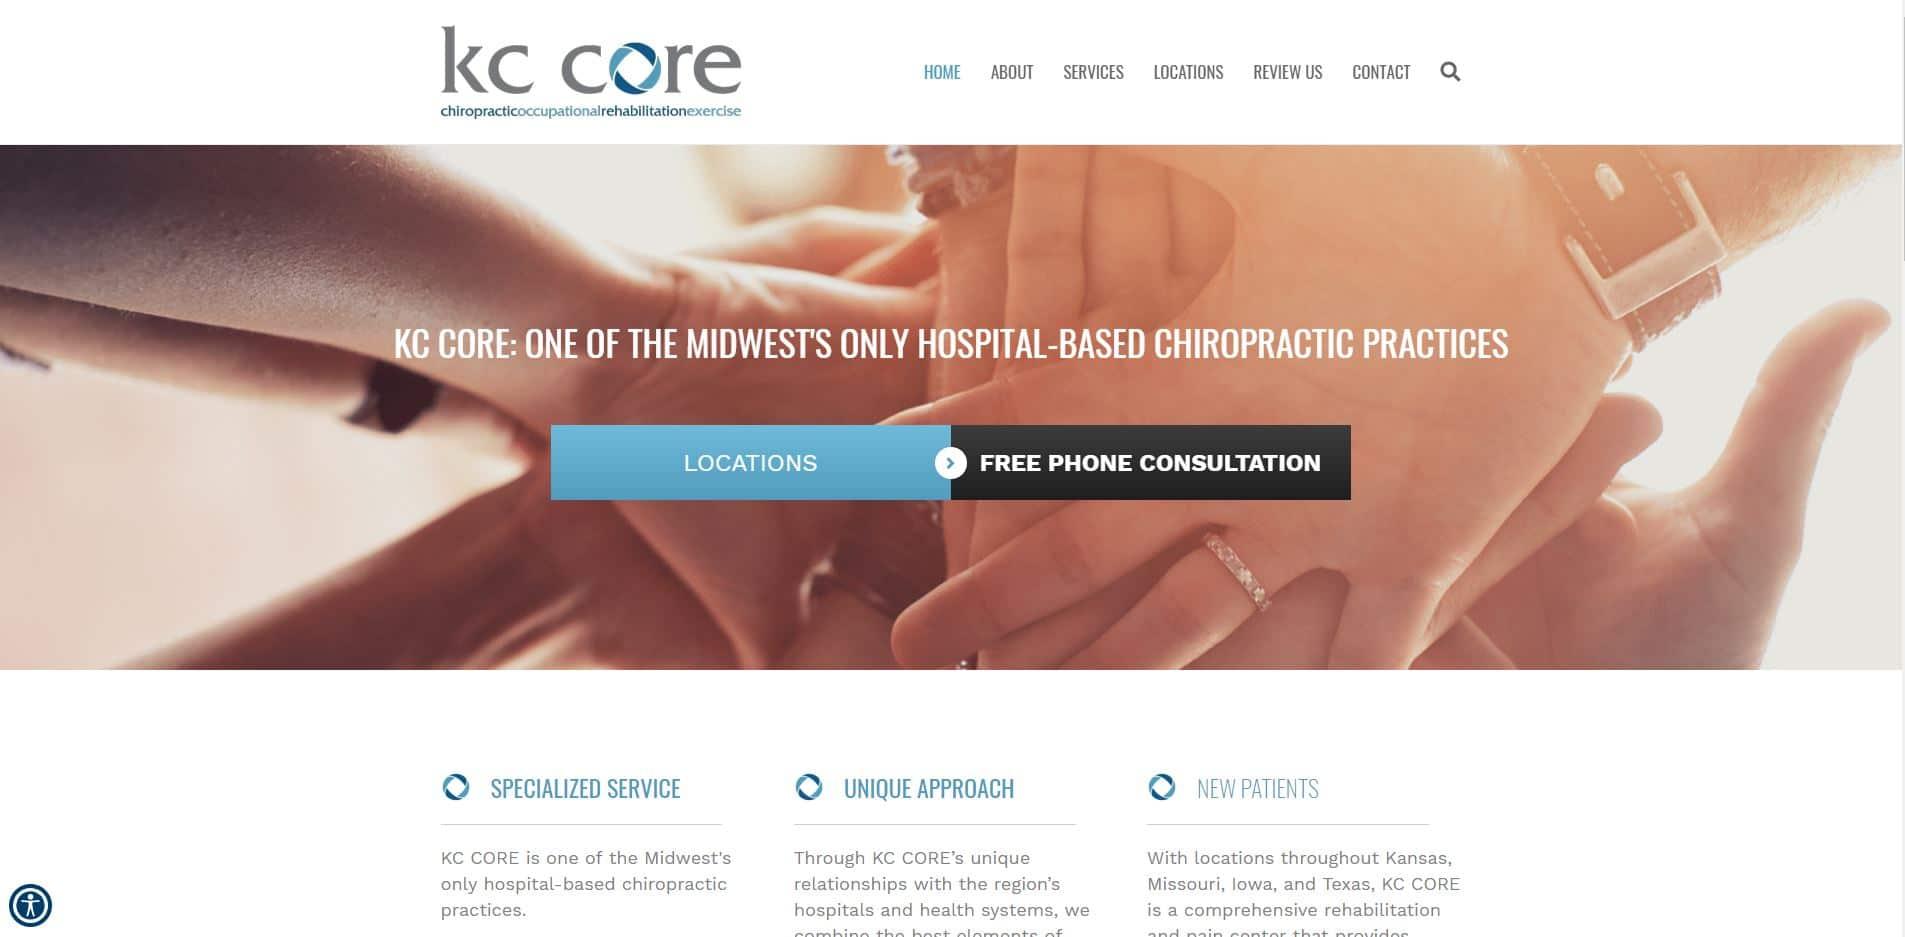 KC CORE Chiropractor